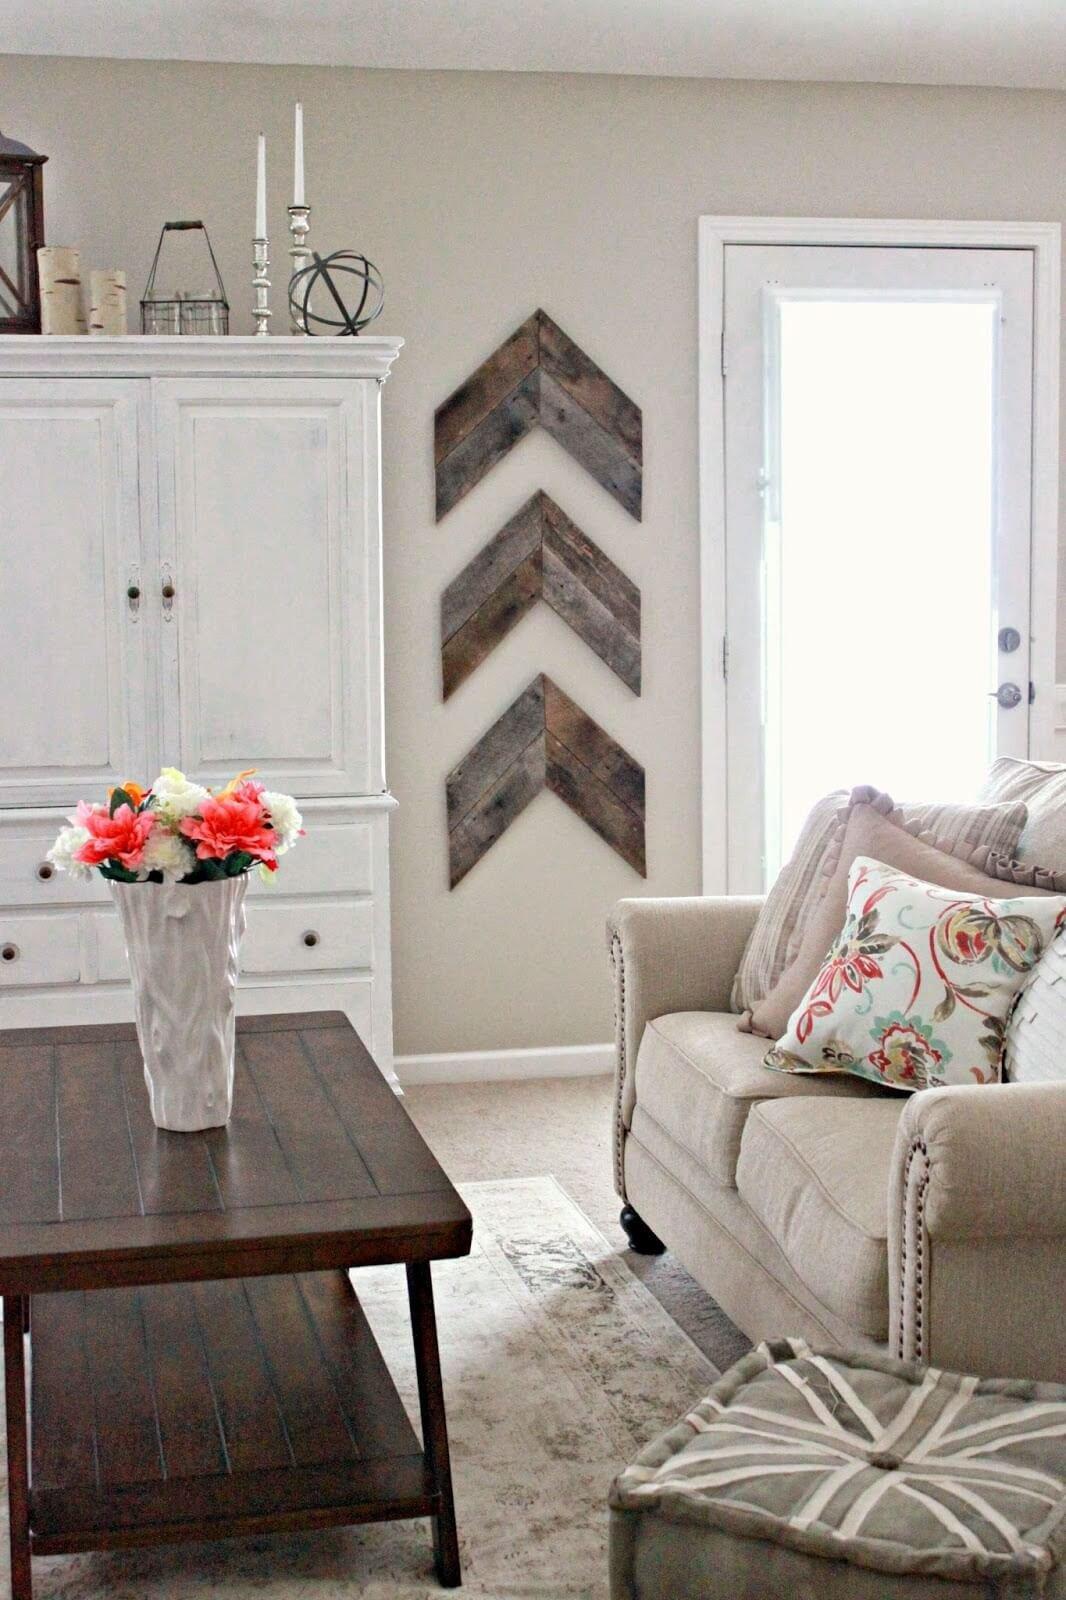 Wall Decor Ideas Living Room Fresh 35 Best Farmhouse Living Room Decor Ideas and Designs for 2017